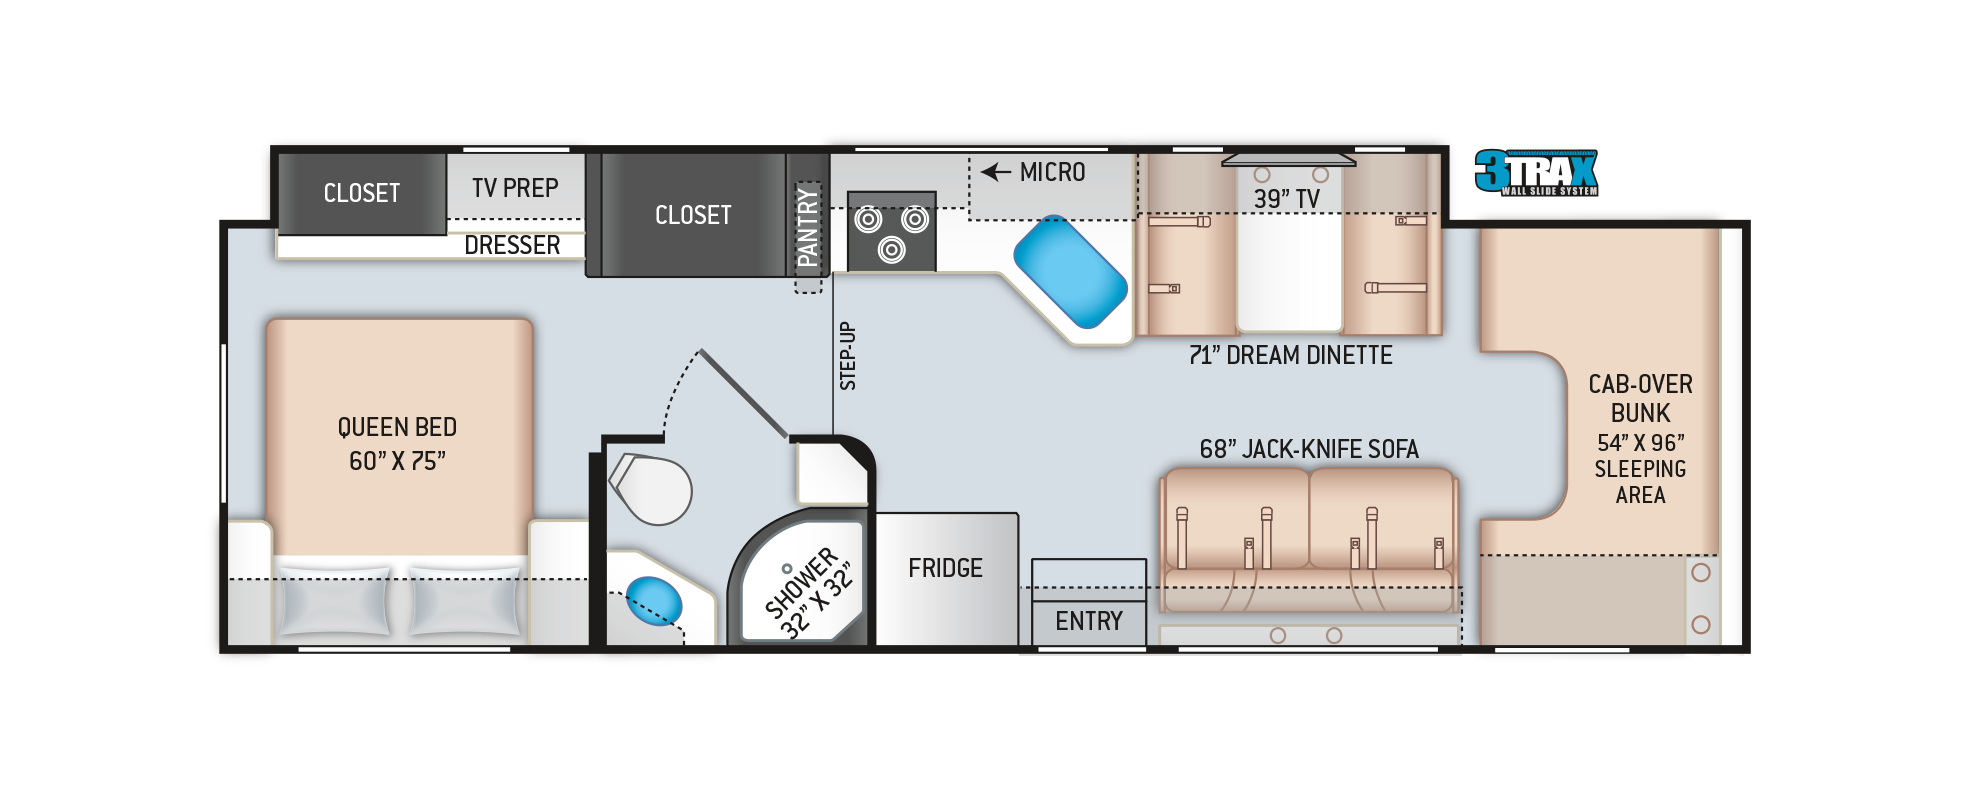 Four Winds Class C Motorhome 31WV Floor Plan